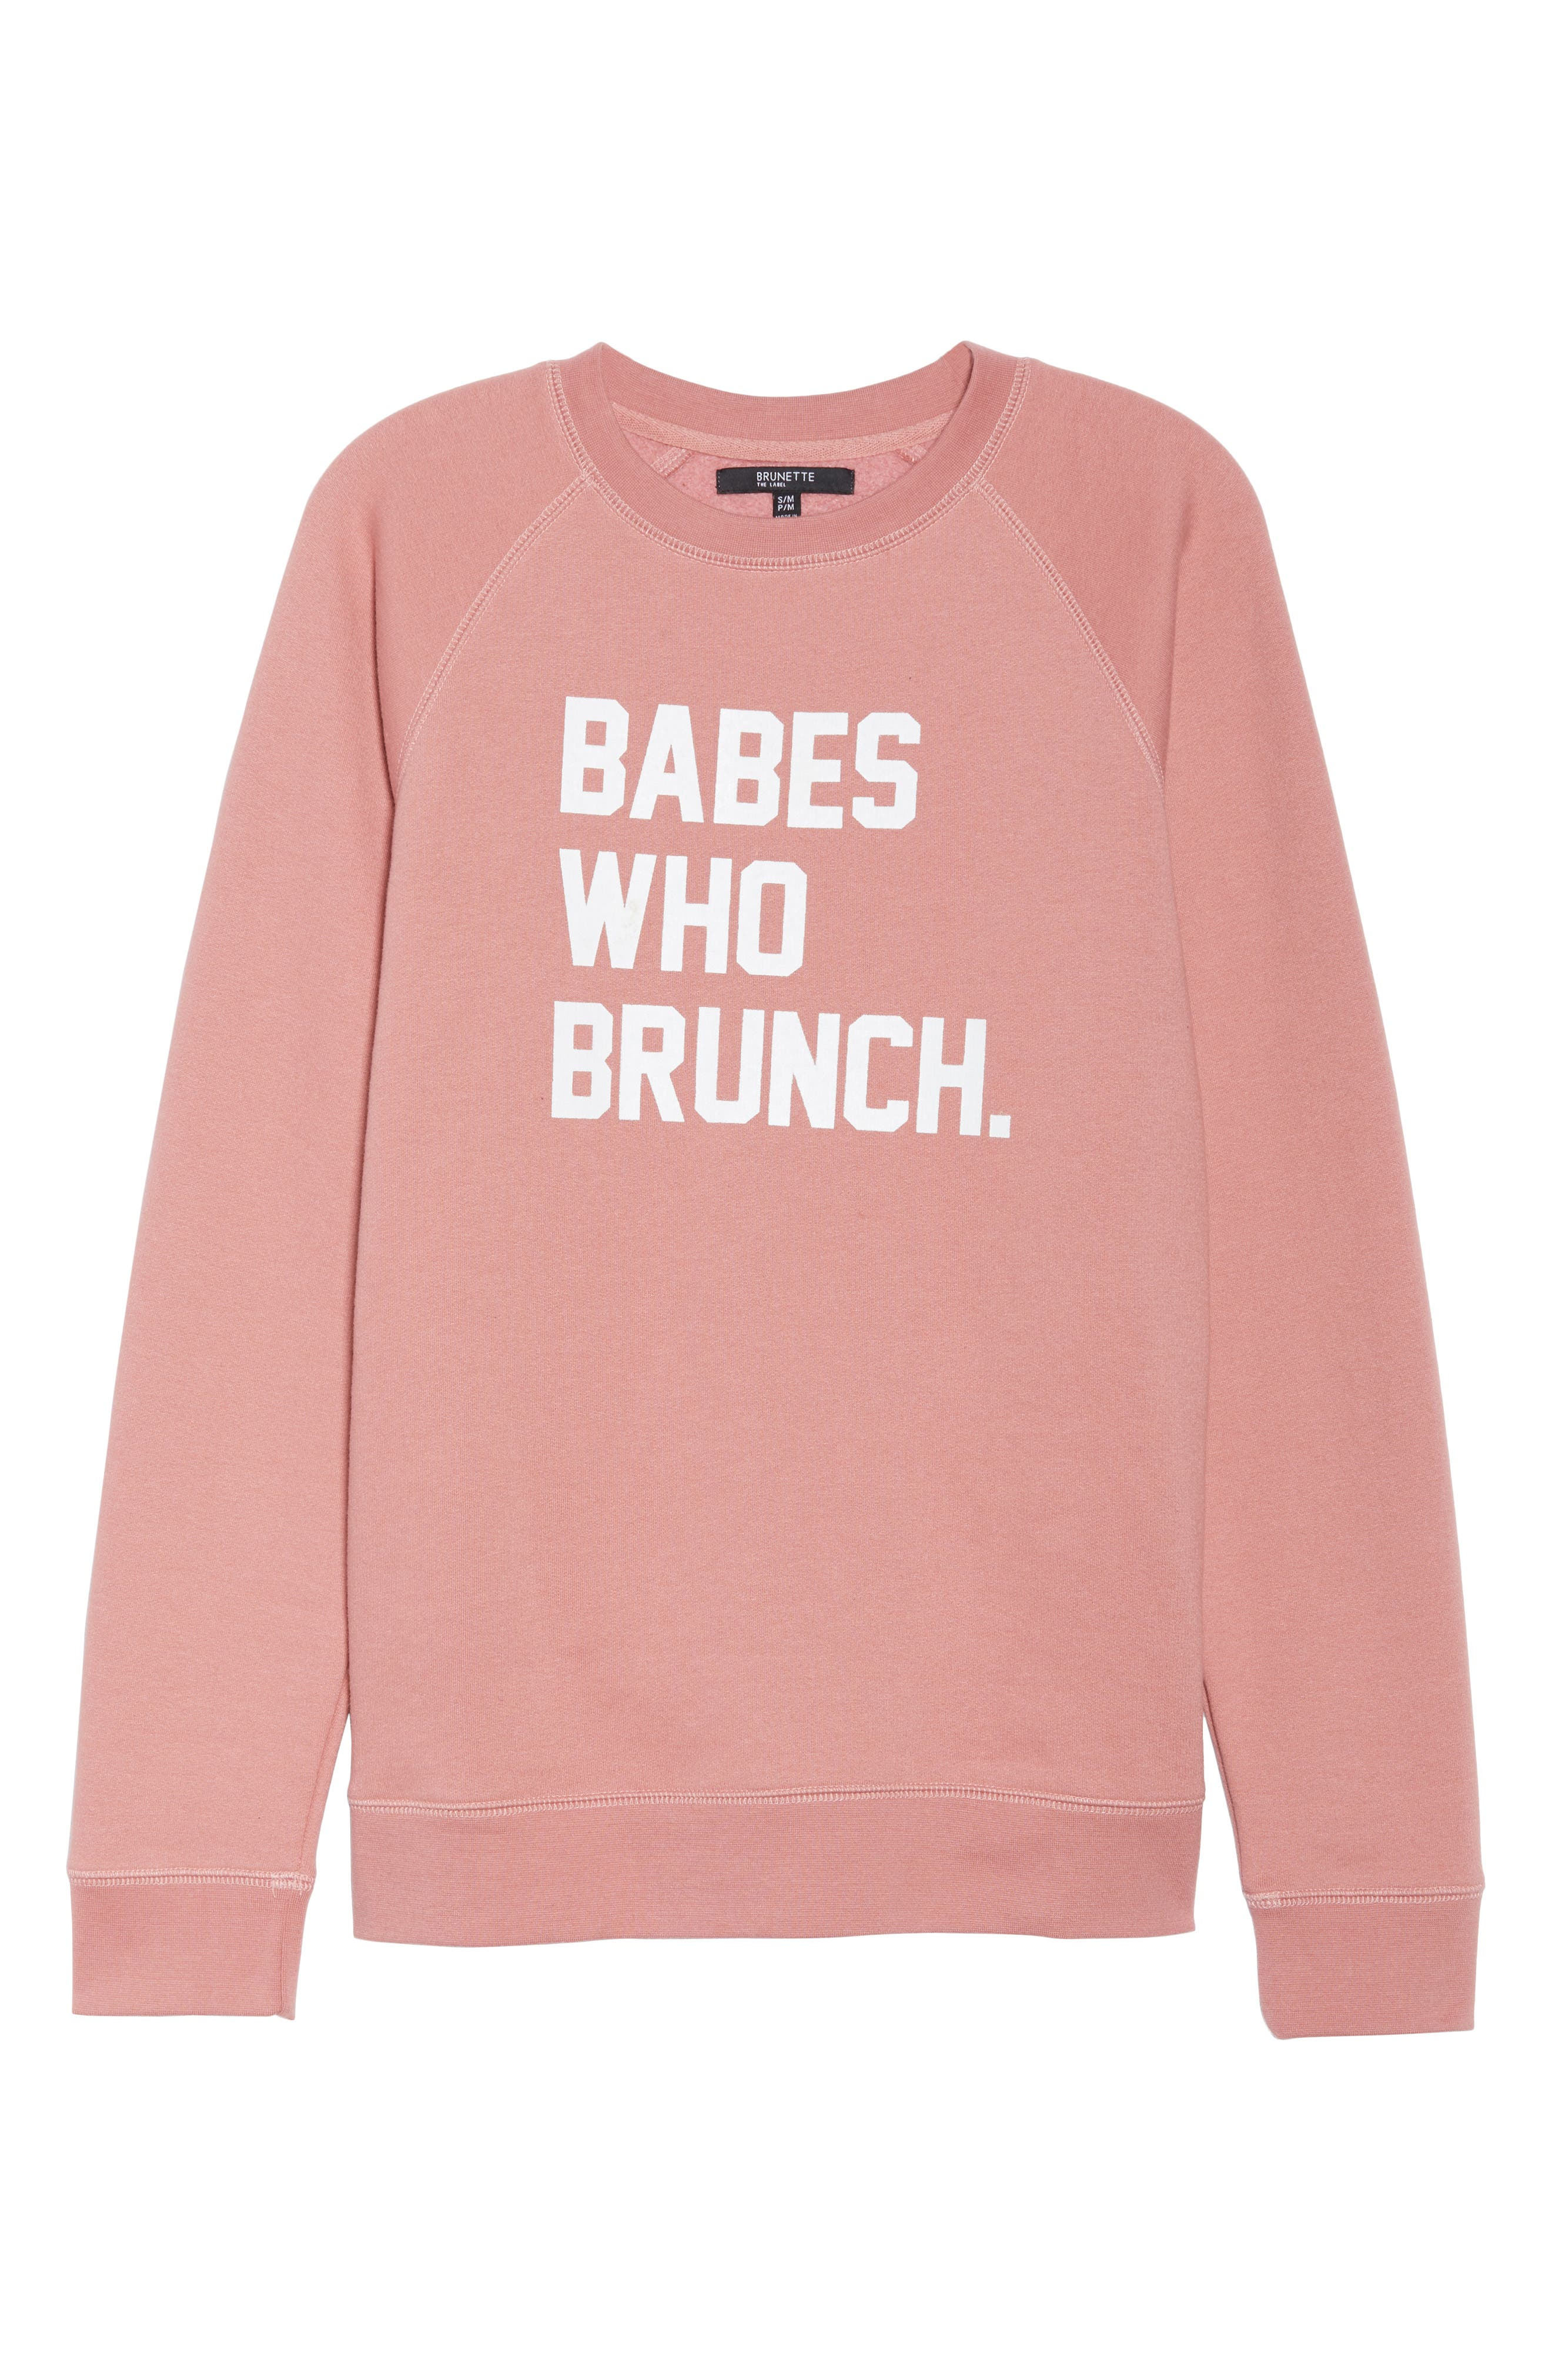 Babes Who Brunch Sweatshirt,                             Alternate thumbnail 6, color,                             955